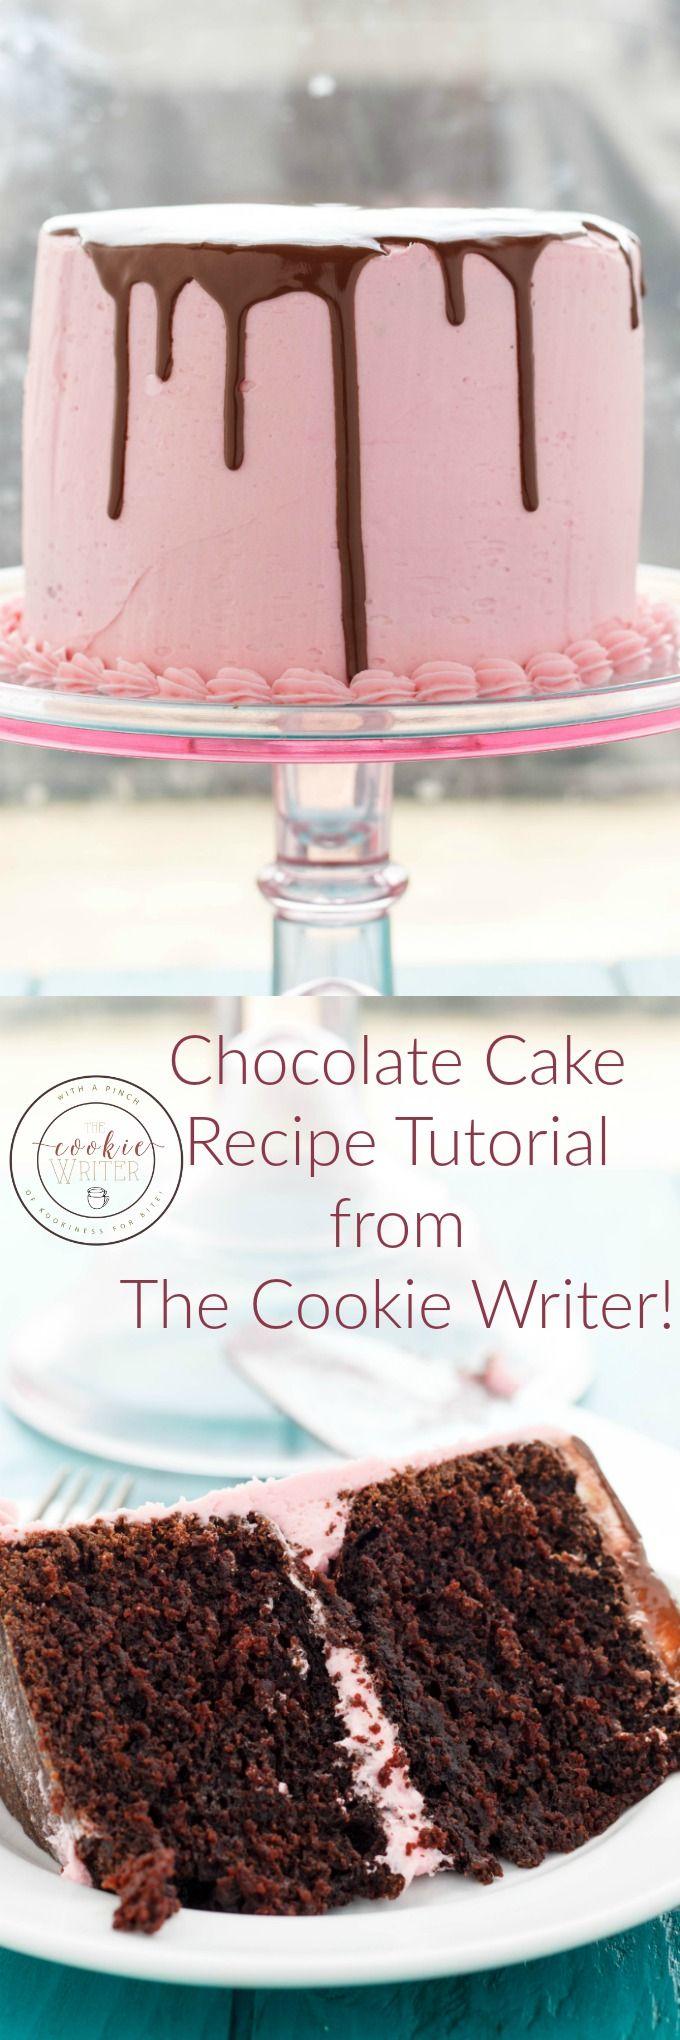 Chocolate Cake Recipe Tutorial from The Cookie Writer!   http://thecookiewriter.com   #cake #dessert #chocolate #vegetarian